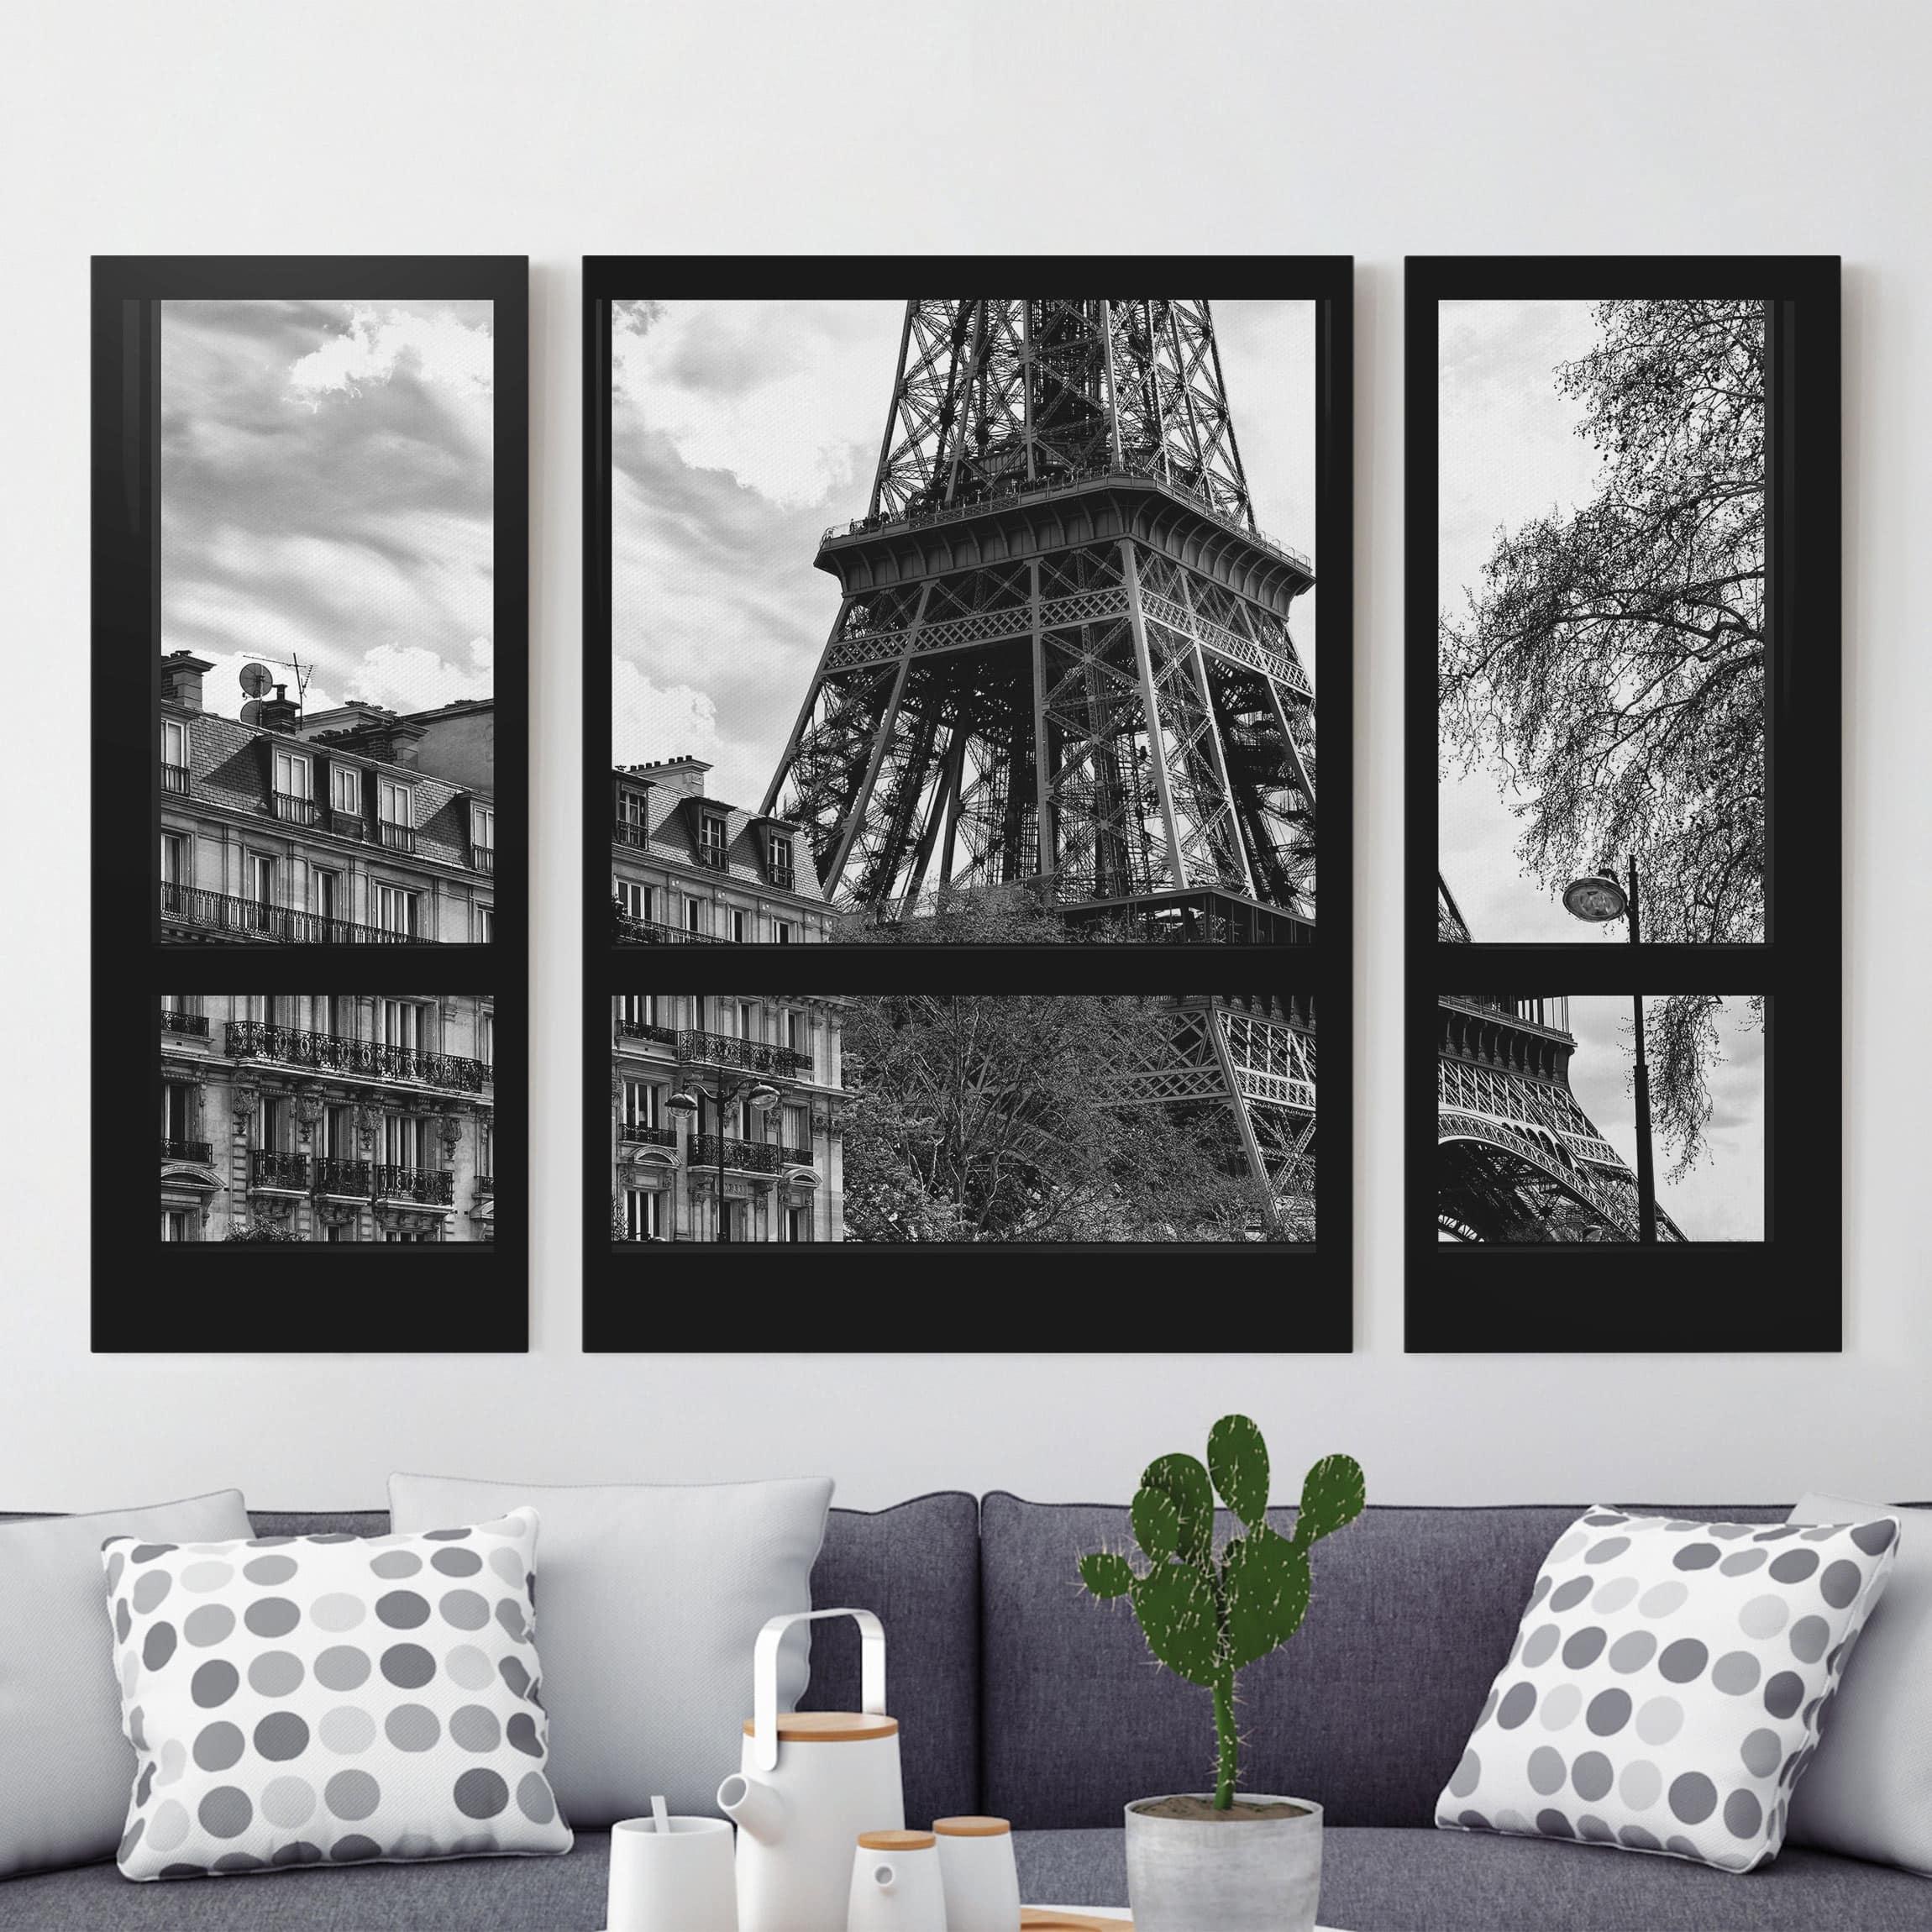 leinwandbild 3 teilig fensterausblick paris nahe am eiffelturm schwarz wei triptychon. Black Bedroom Furniture Sets. Home Design Ideas